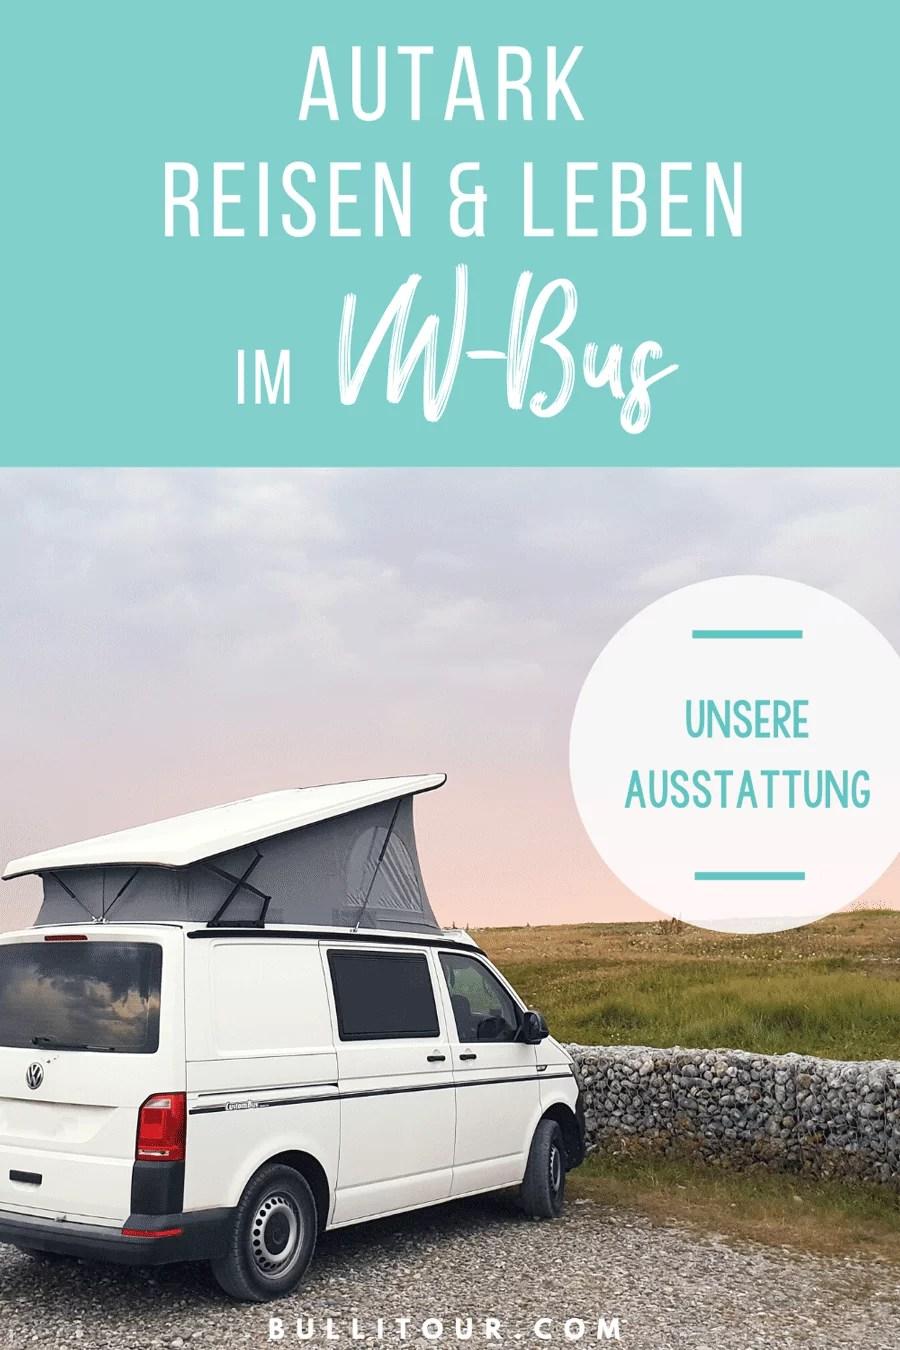 Vanlife - autark reisen & leben im Campern